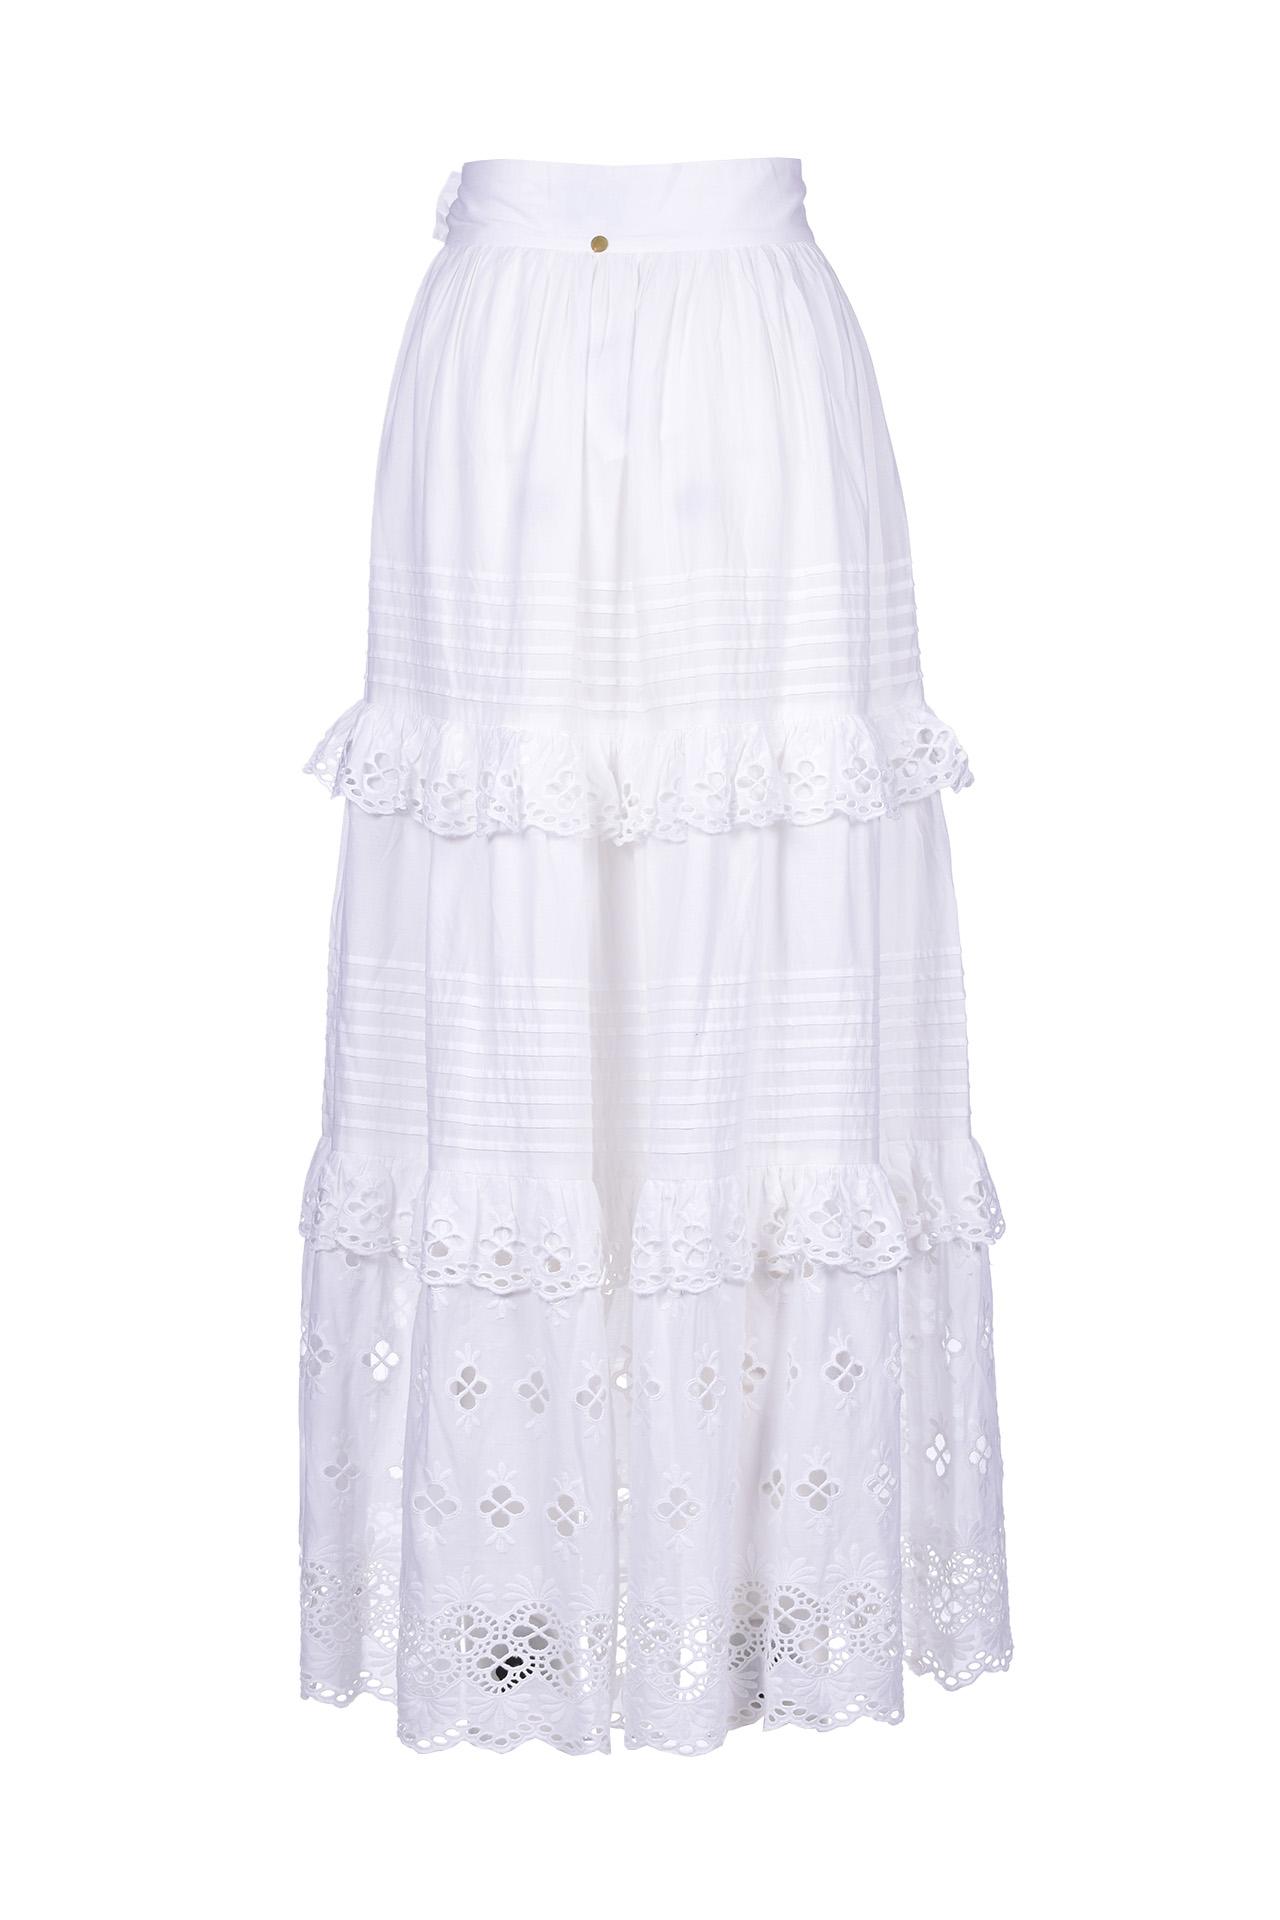 Ally long skirt with white lace ANTIK BATIK | Skirts | ALLY1SKIWHITE